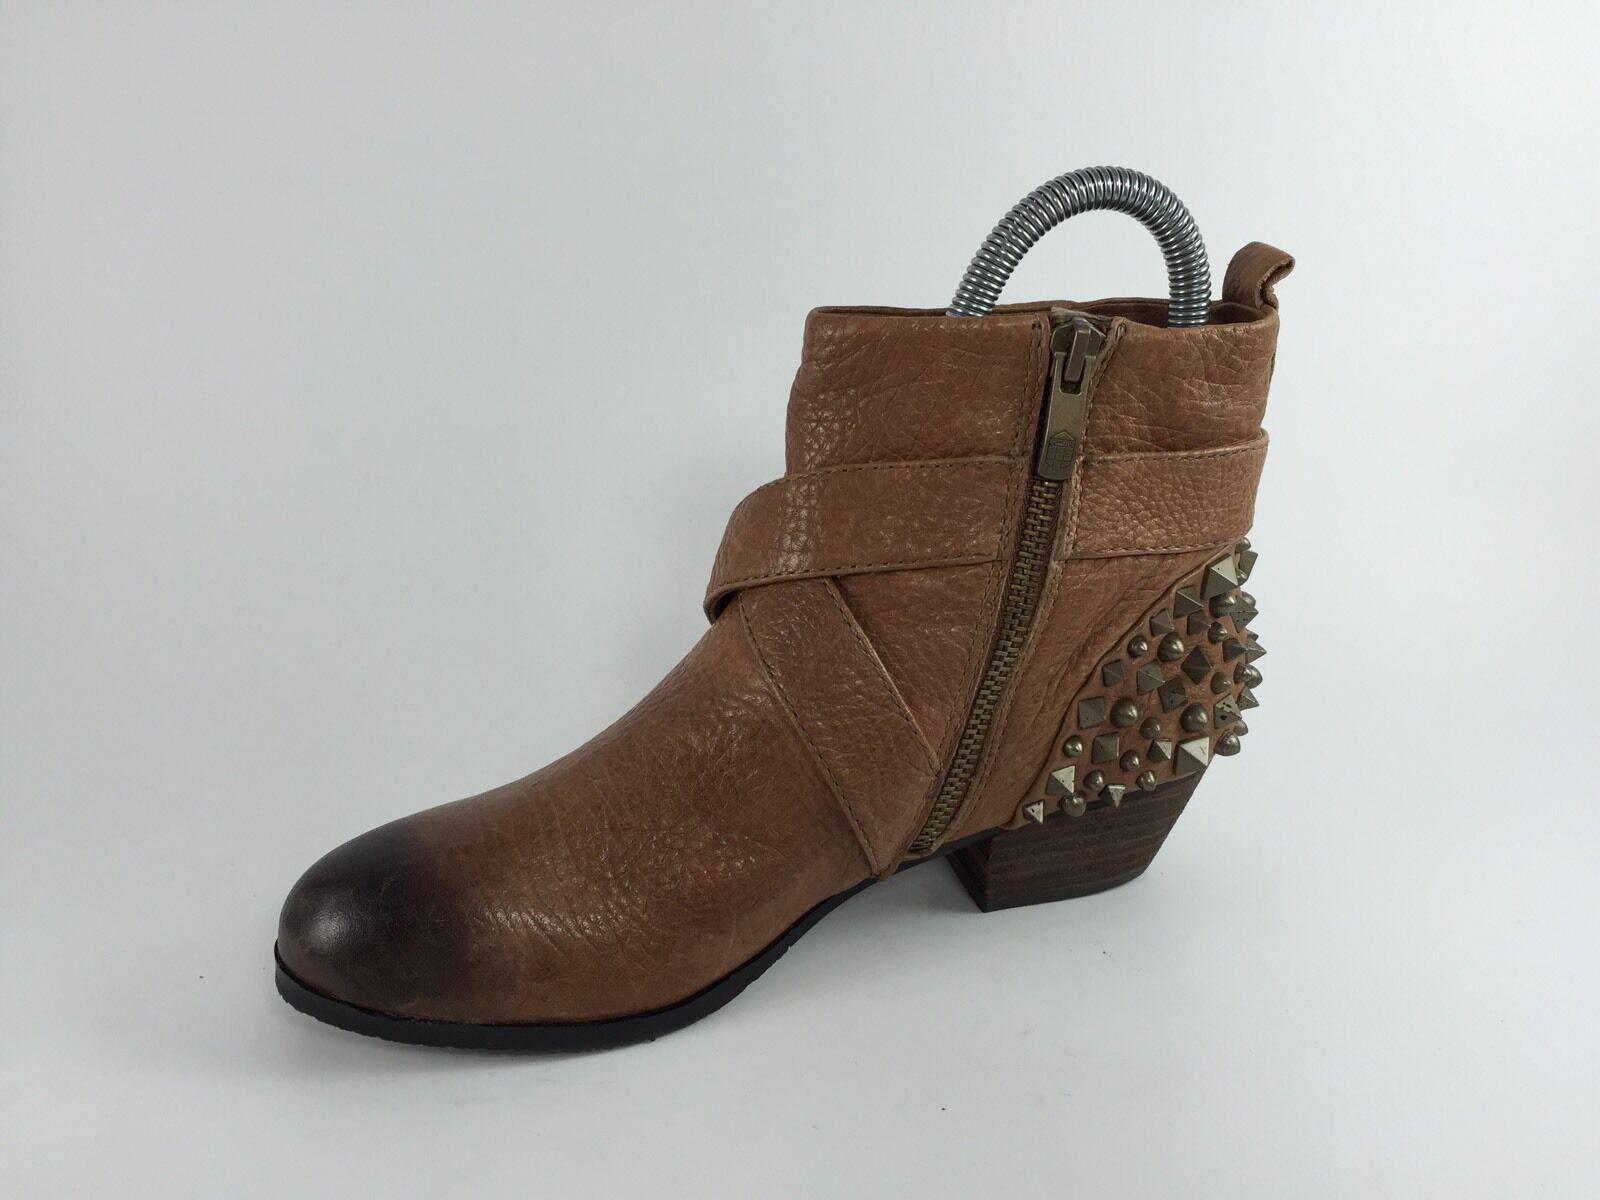 Vince Camuto Camuto Vince Damenschuhe Braun Leder Ankle Stiefel 6 B 885051